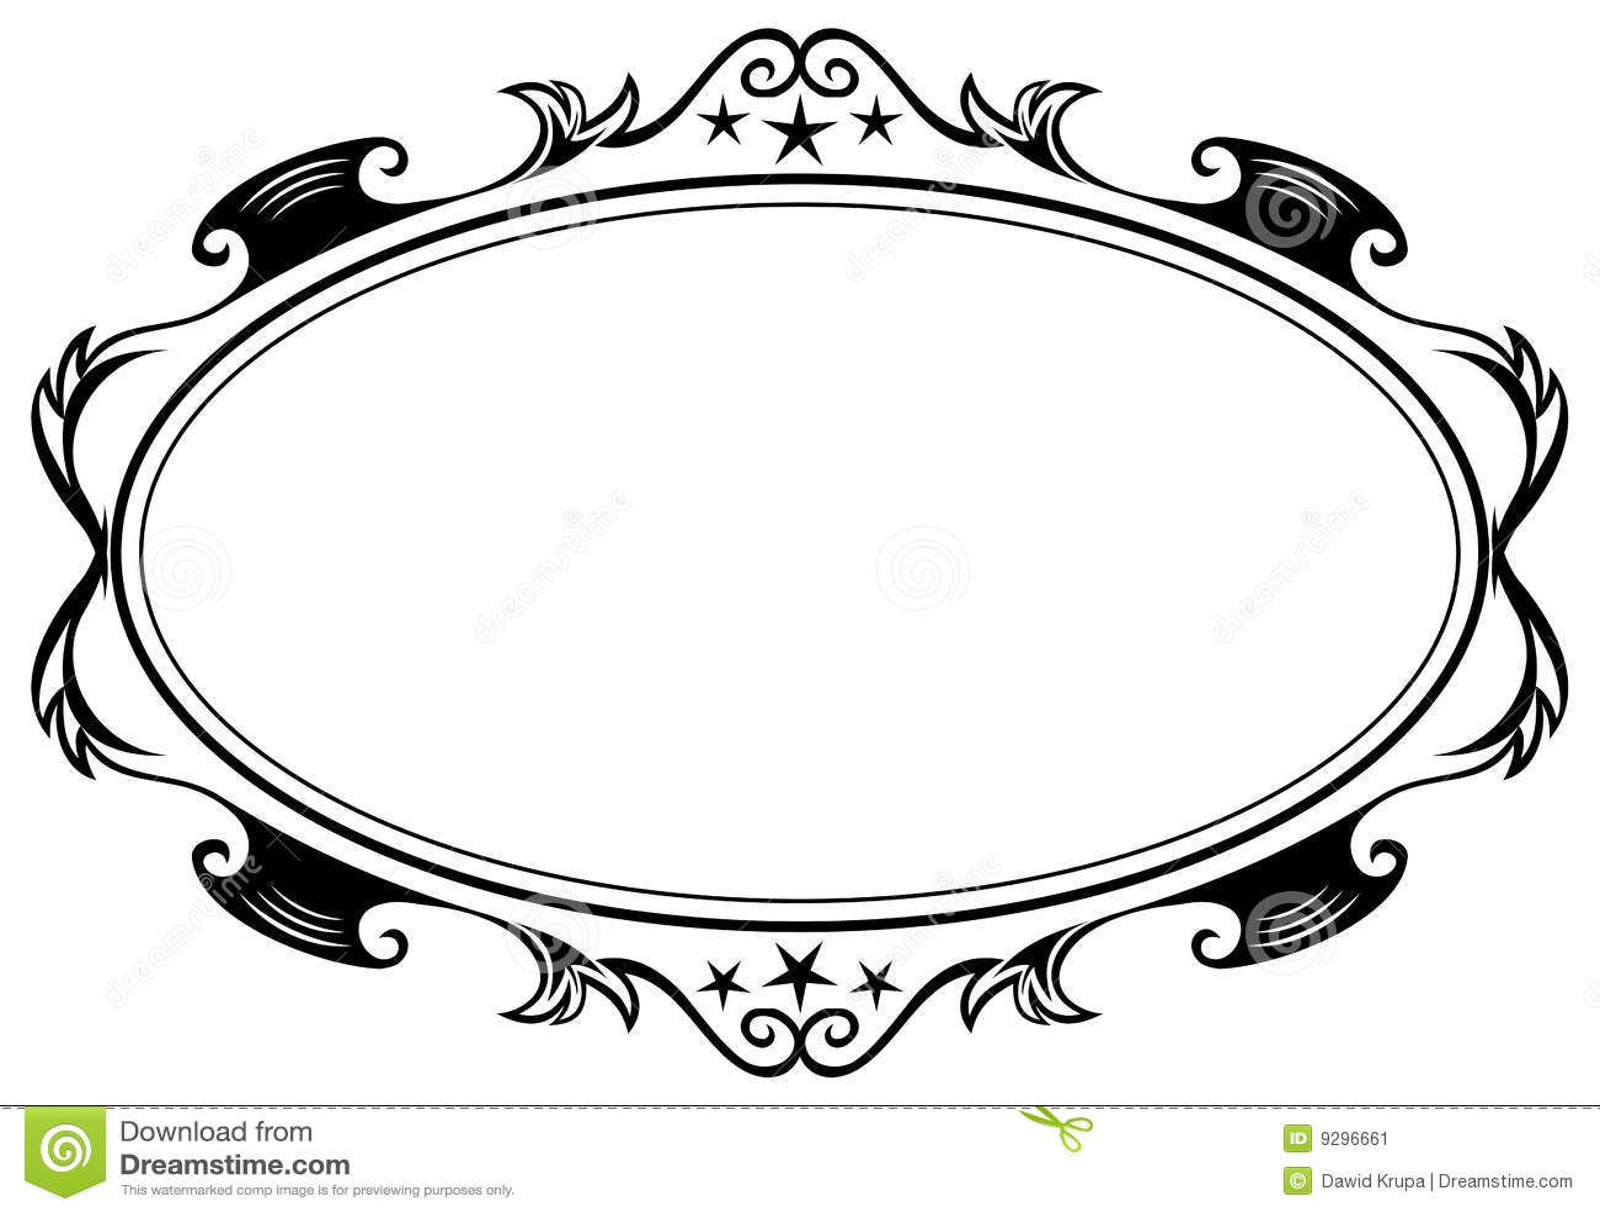 Antique Oval Frame Stock Image